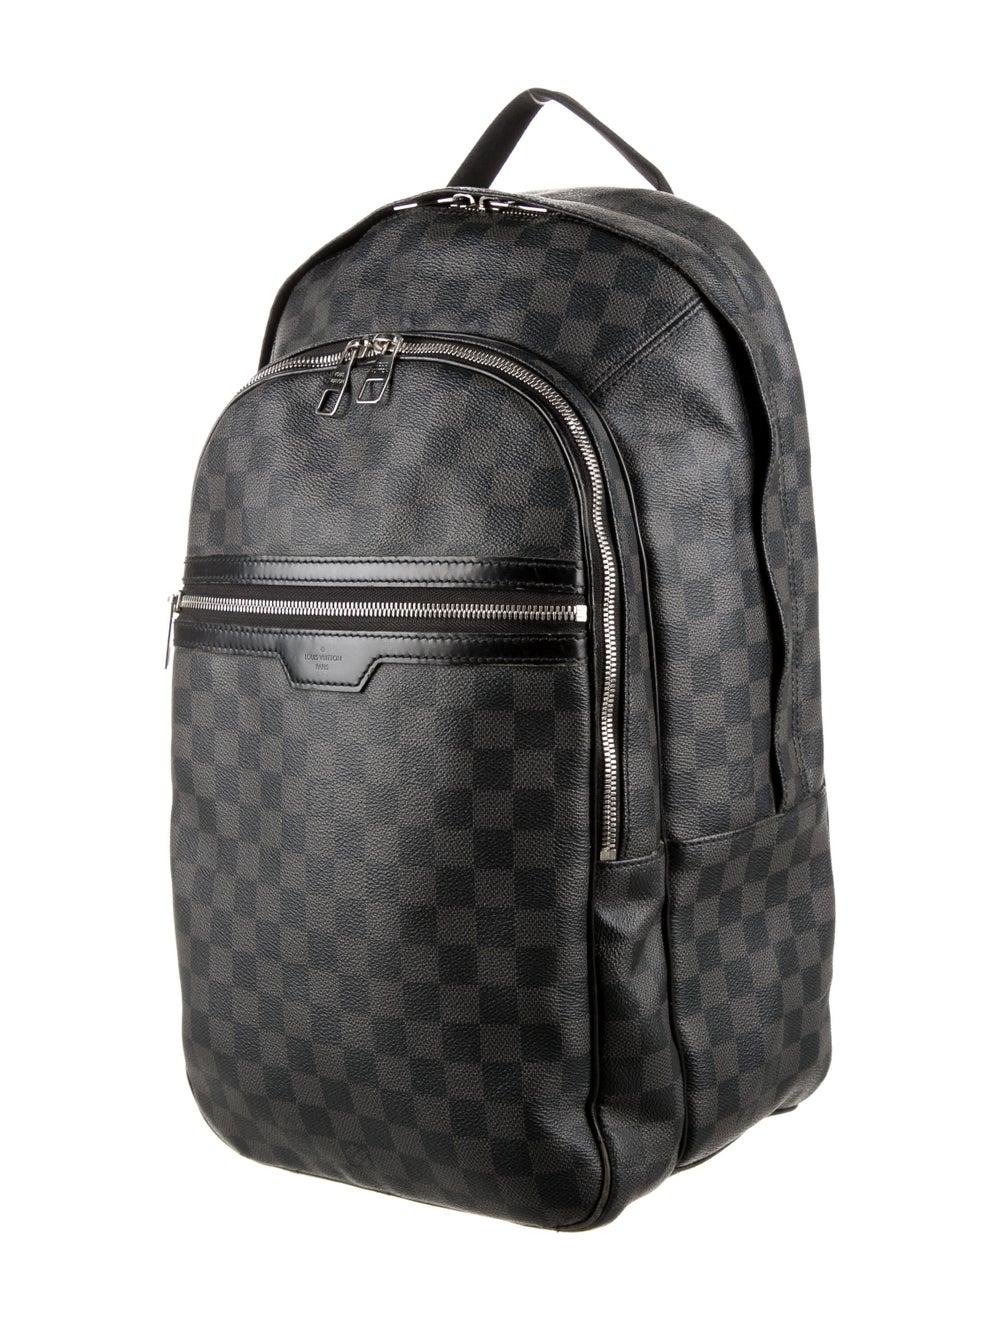 Louis Vuitton Damier Graphite Michael Backpack Gr… - image 2